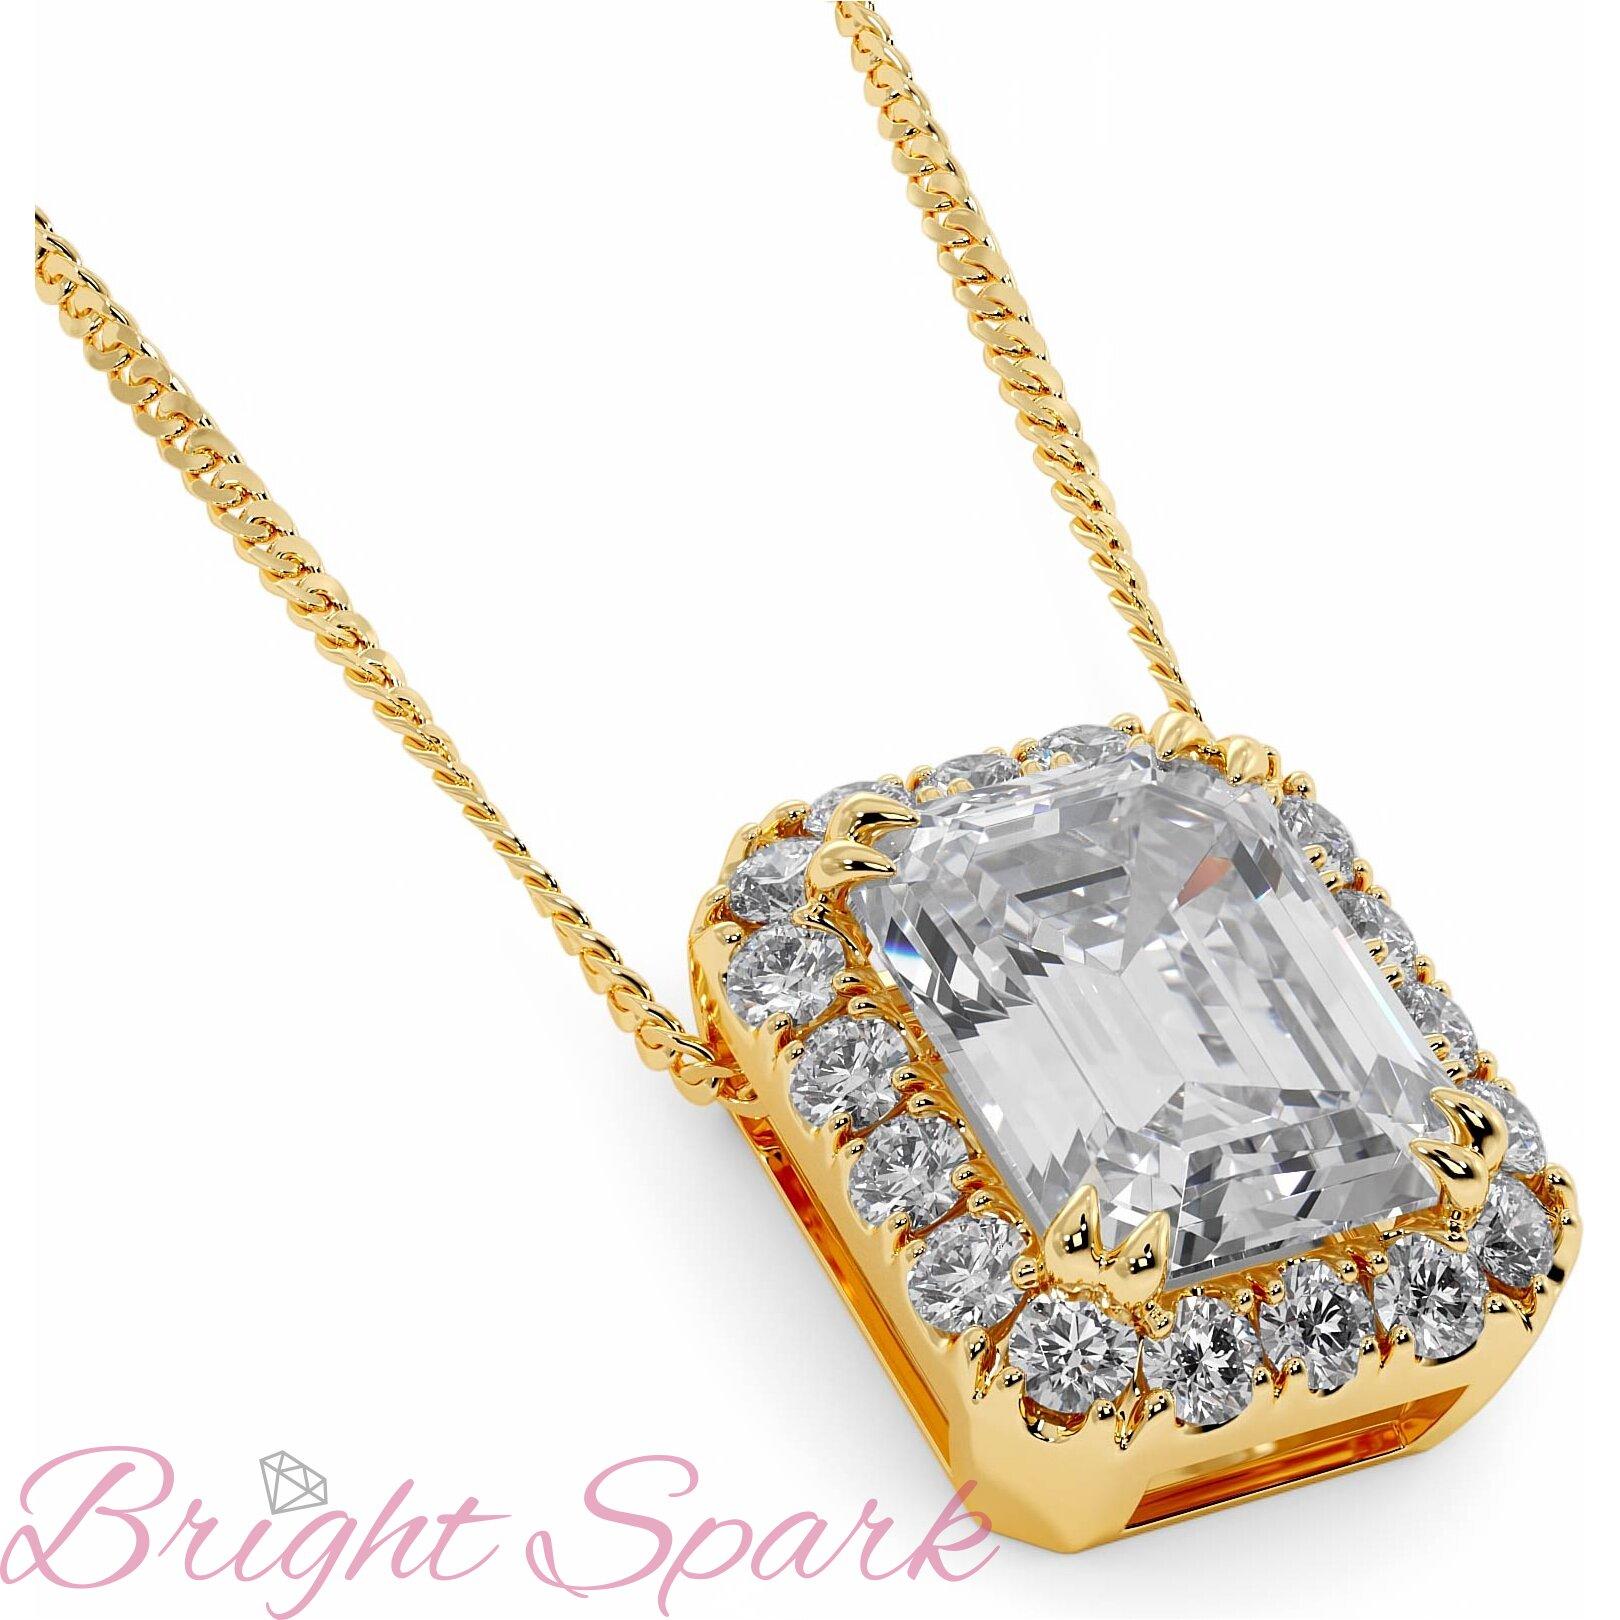 Кулон желтого золота с бриллиантом изумрудной огранки в ореоле 1,8 карата Bertha